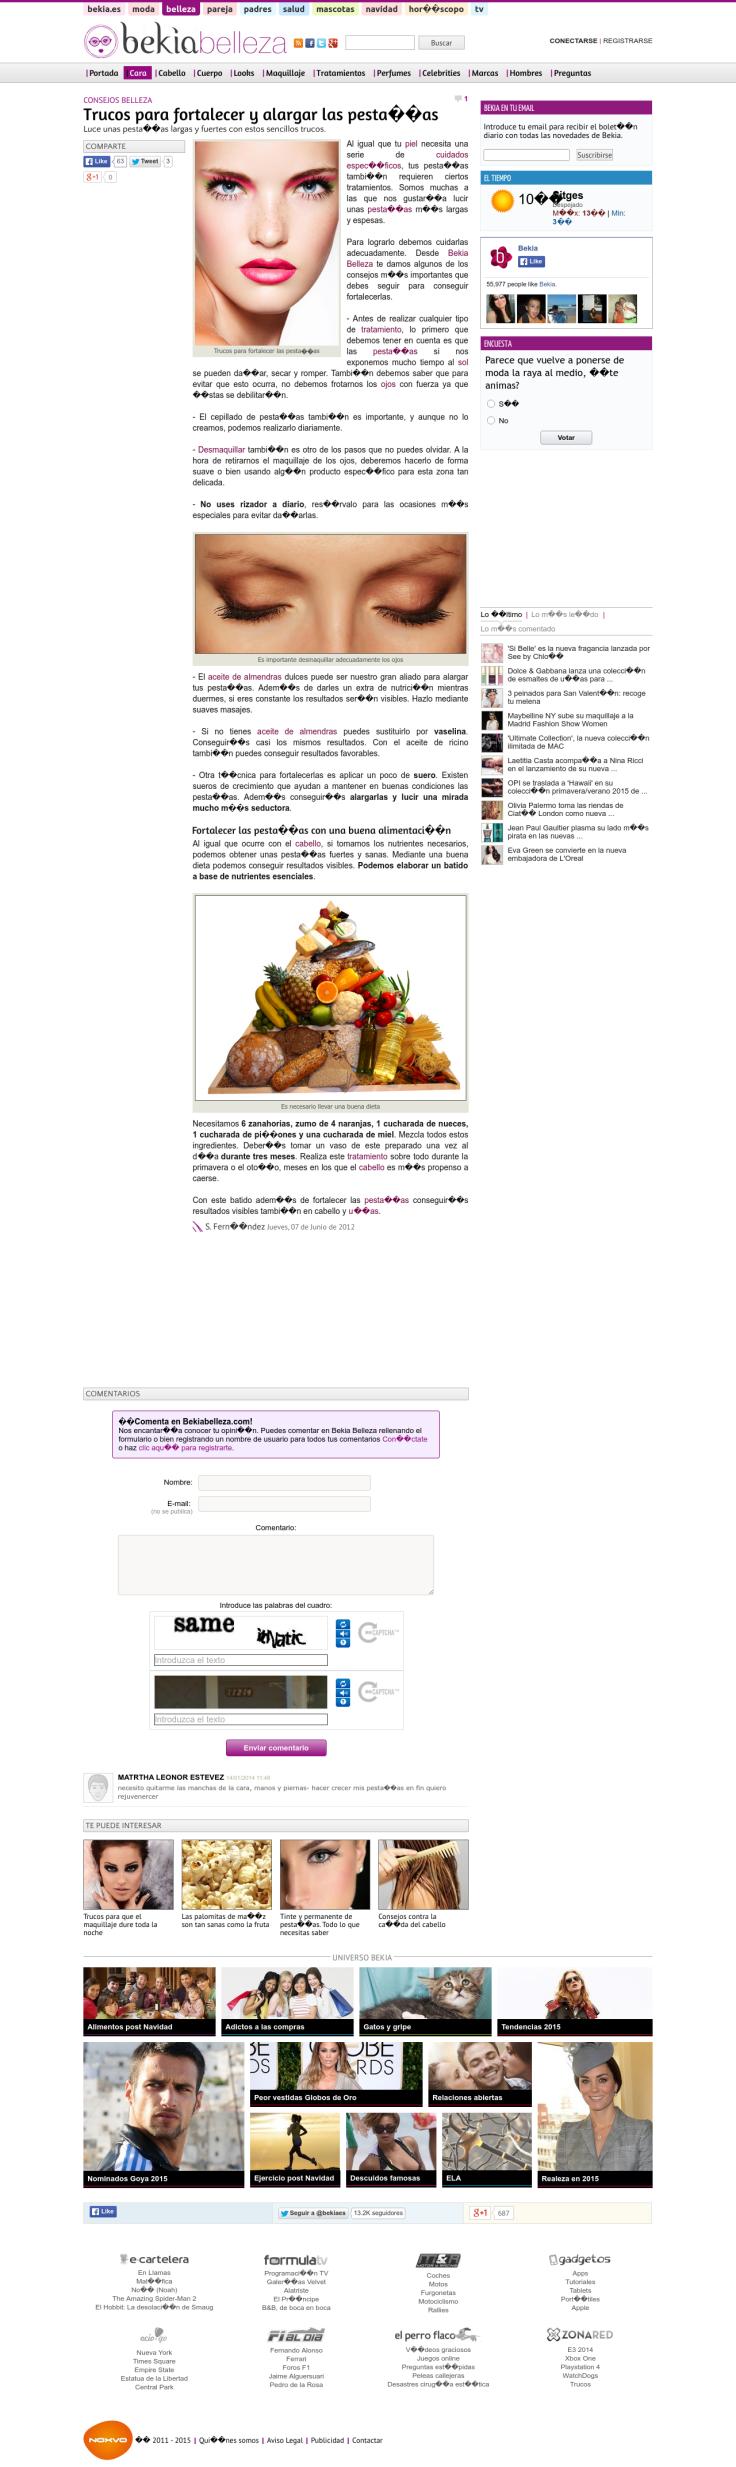 Website'http%3A%2F%2Fwww.bekiabelleza.com%2Fcara%2Ftrucos-fortalecer-alargar-pestanas%2F' snapped on Page2images!